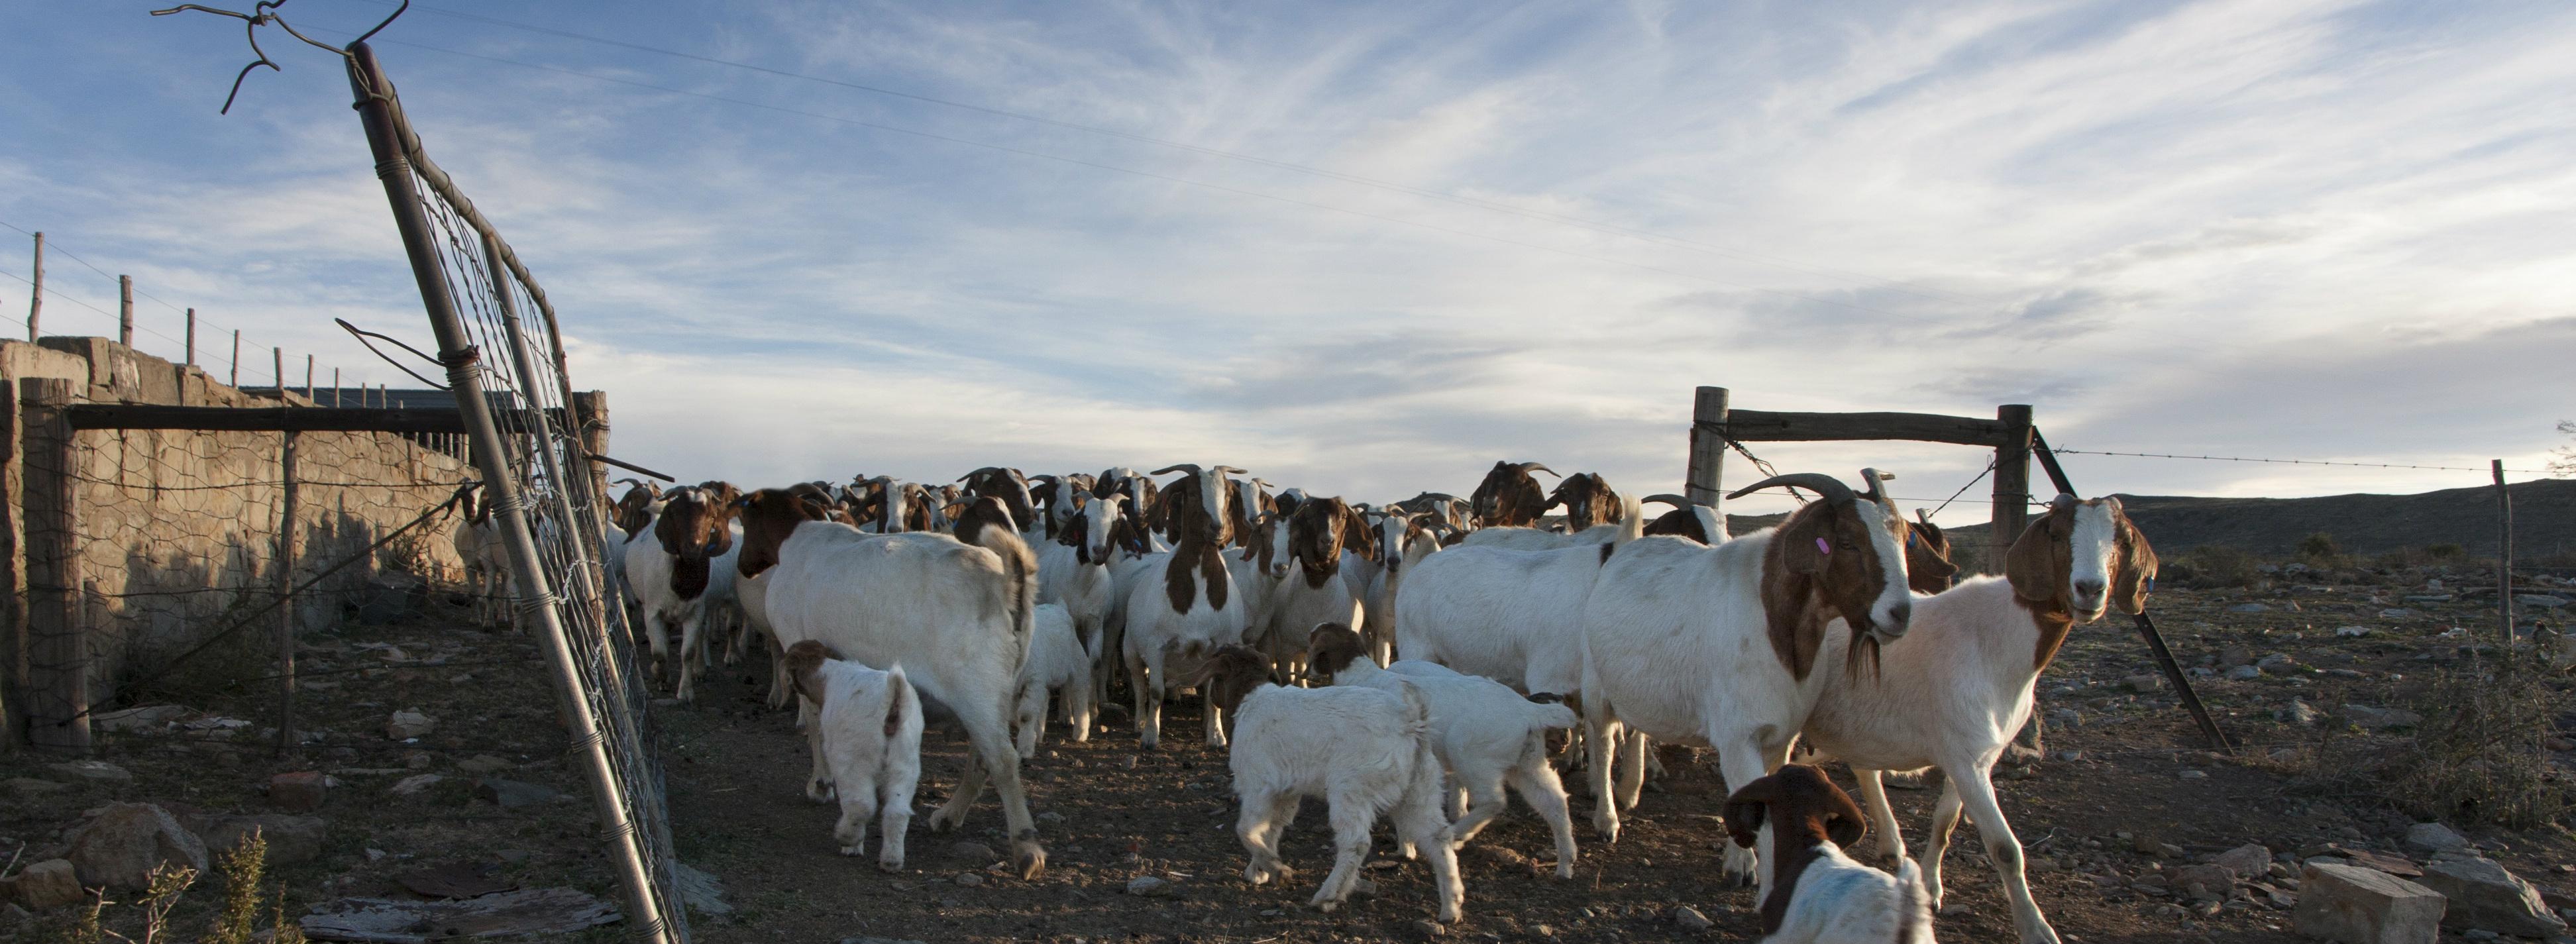 Goats on a farm long